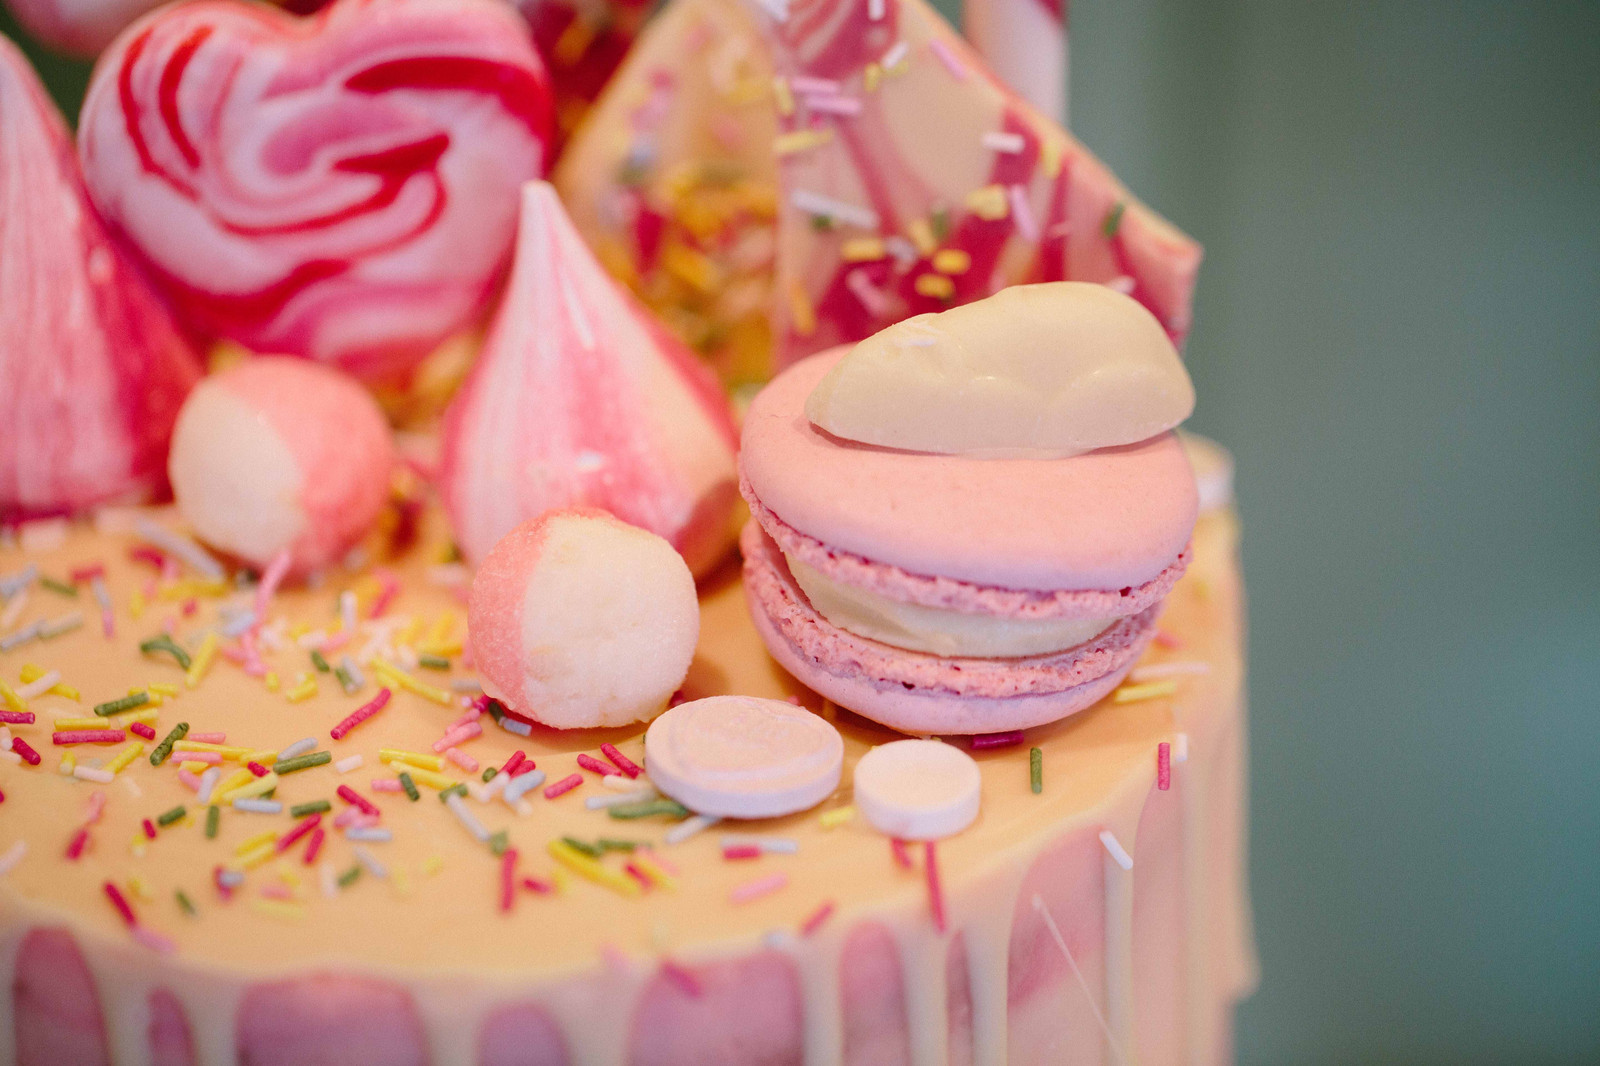 Wedding Cake Photo Gallery | Dorset | Hampshire | Lucie Loves To Bake